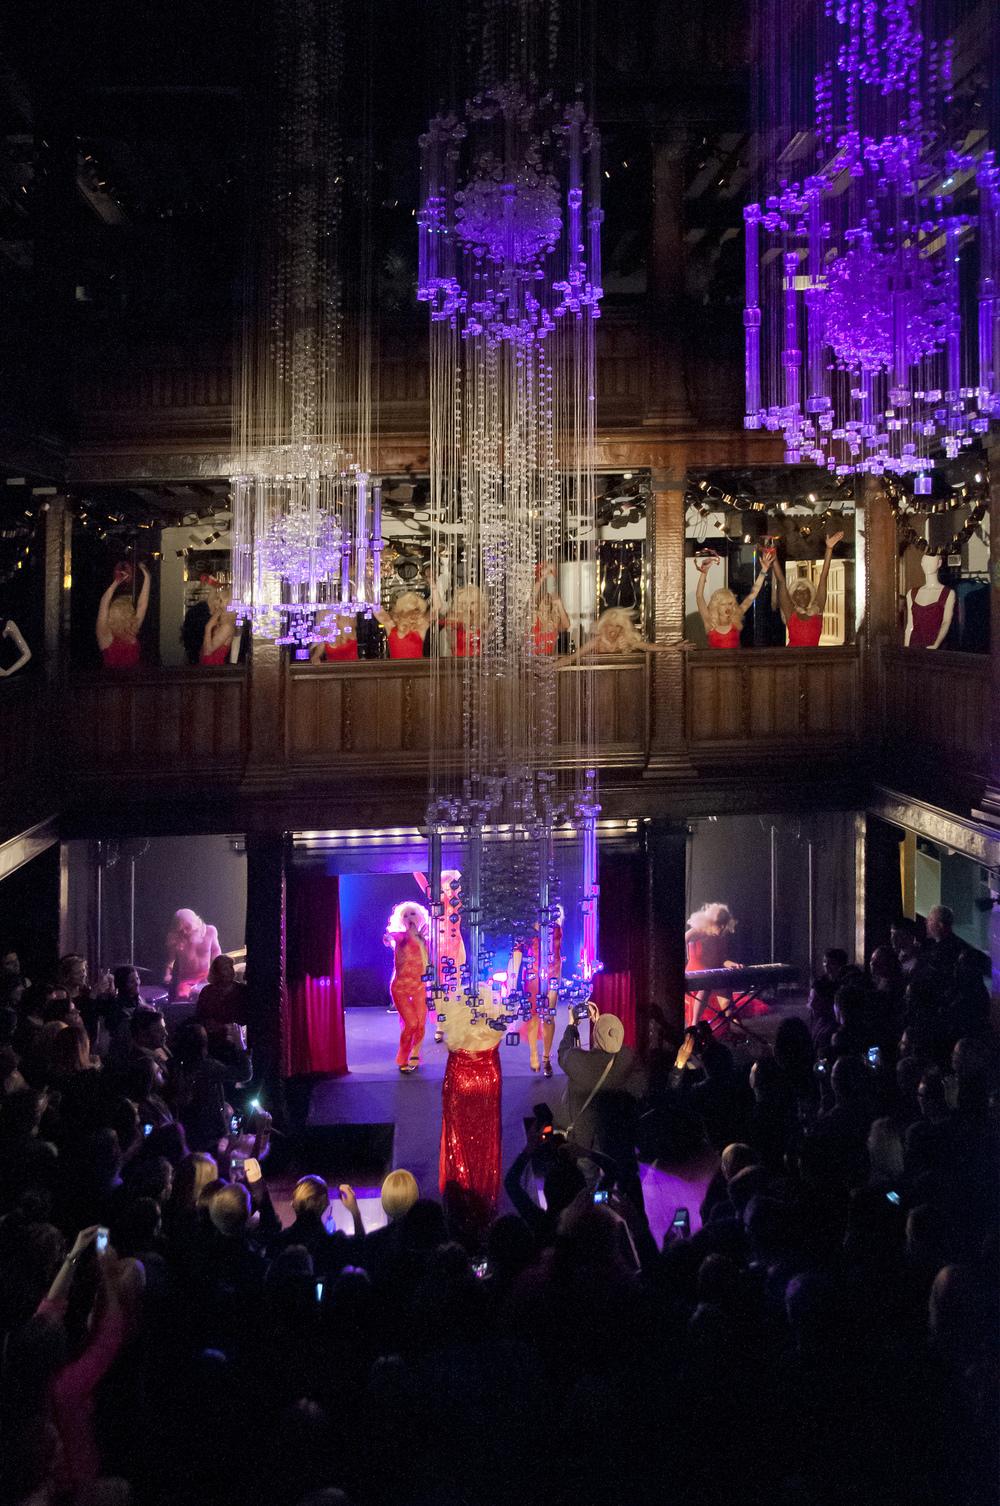 The Day I Set You Free,  Theo Adams Company, Liberty London, November 2012 (performer)